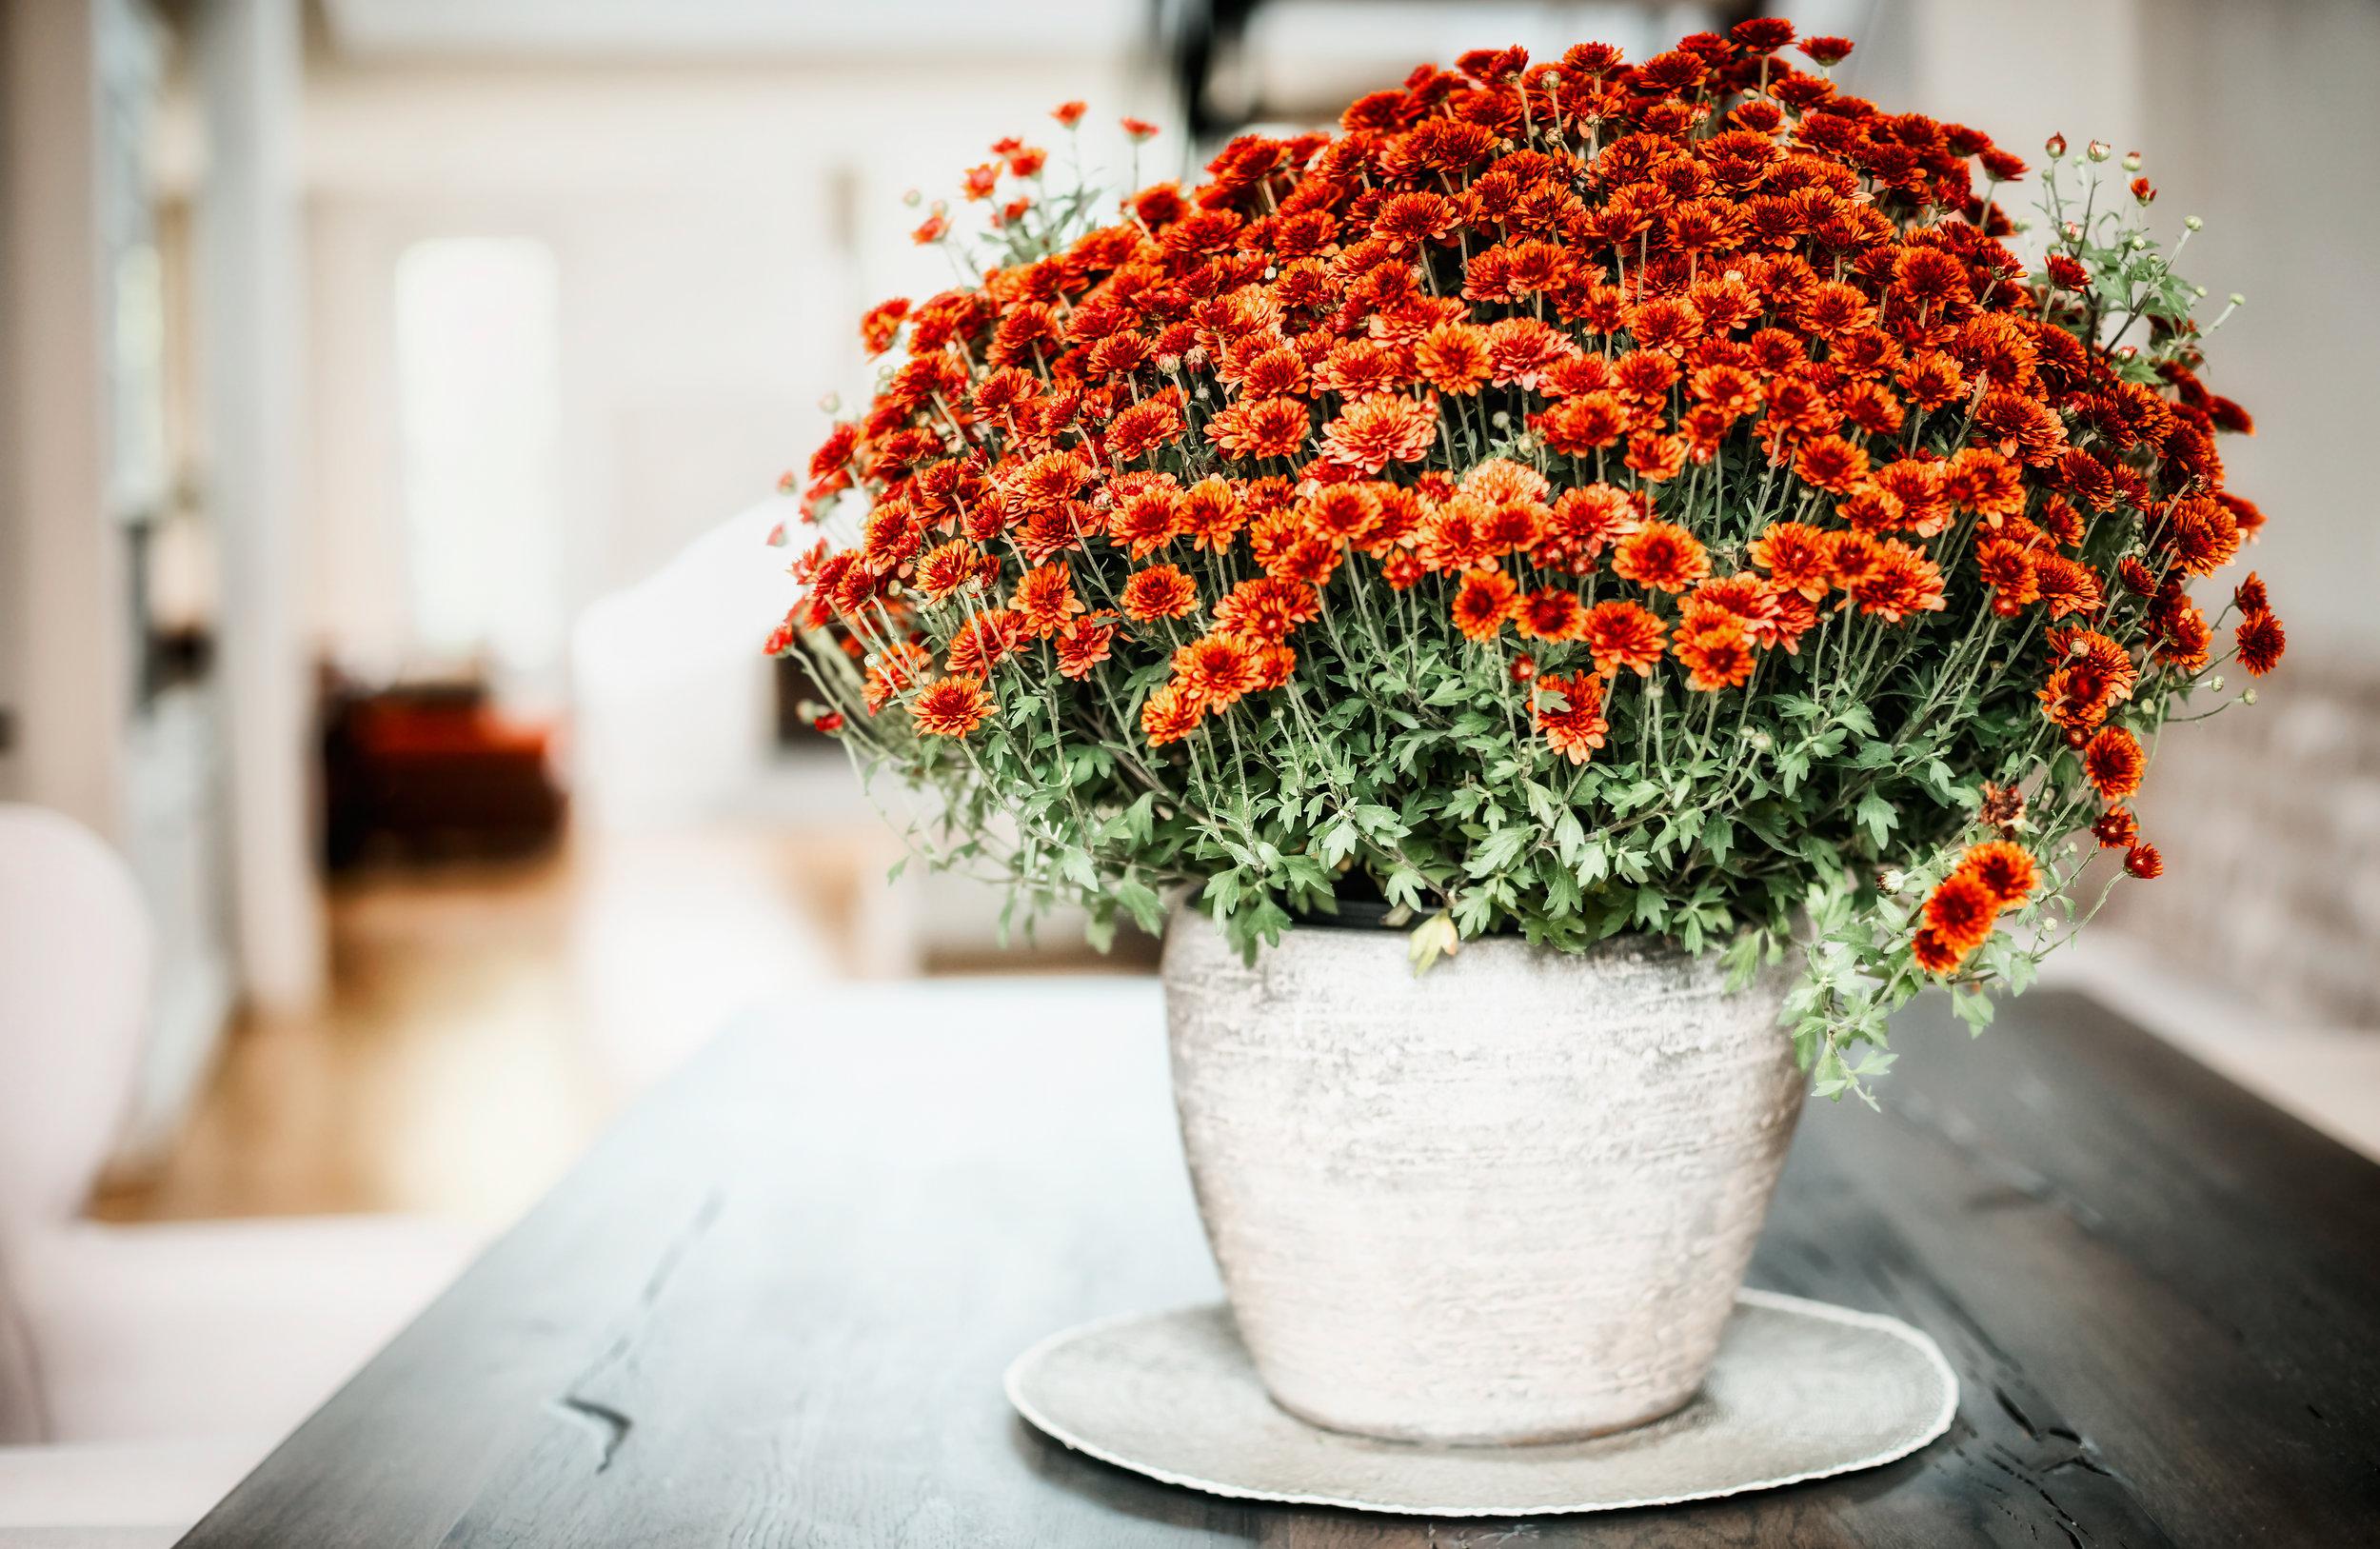 Chrysanthemum_AdobeStock_123016725.jpeg